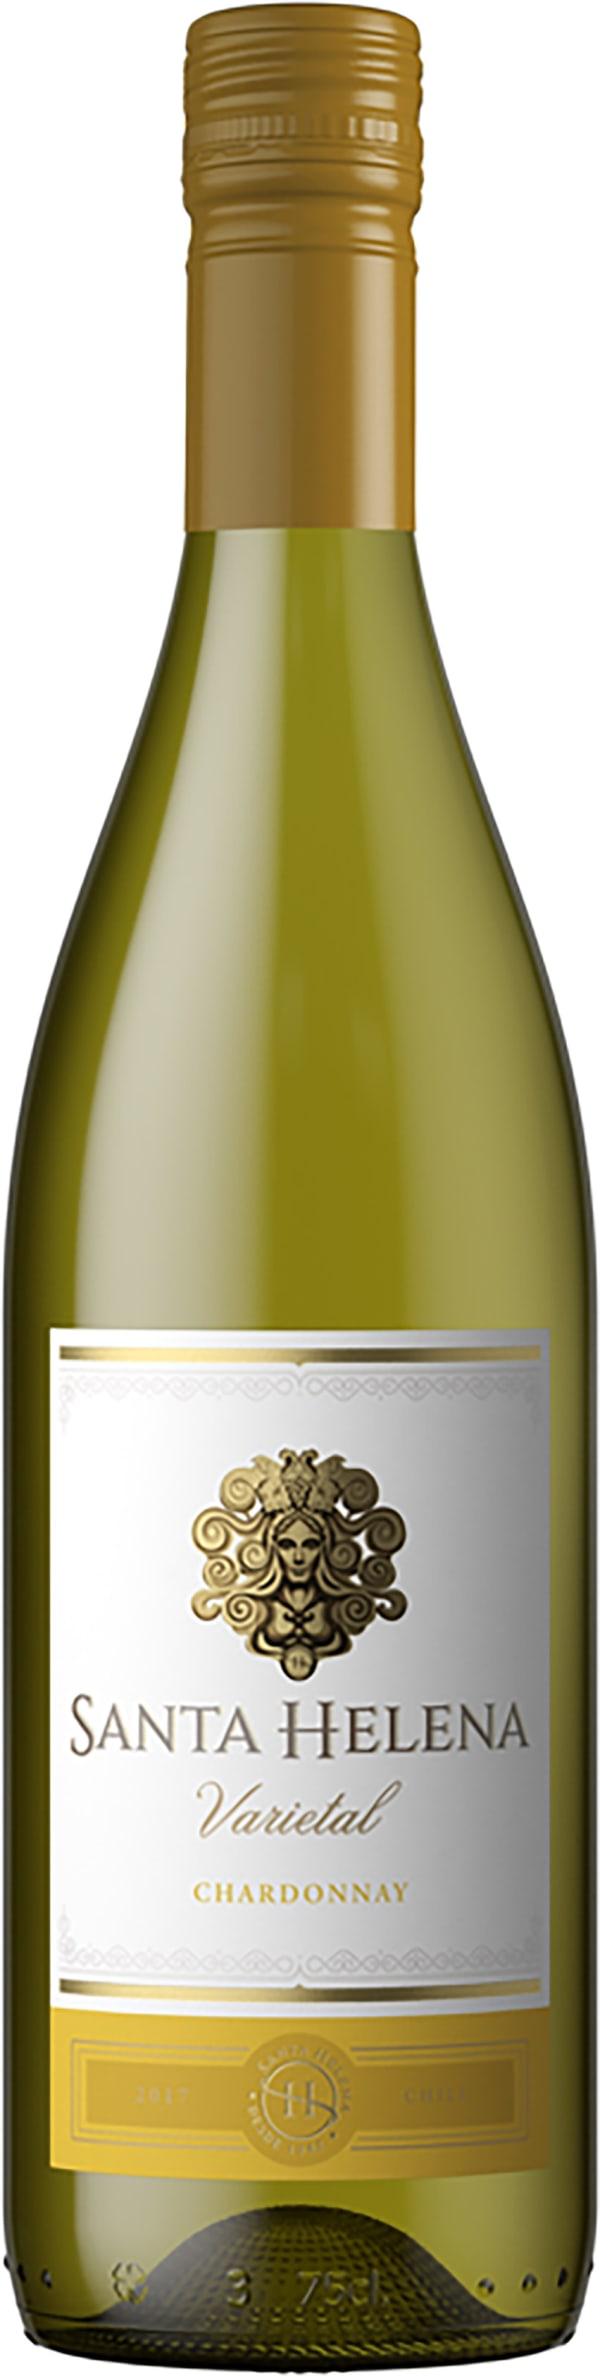 Santa Helena Varietal Chardonnay 2017